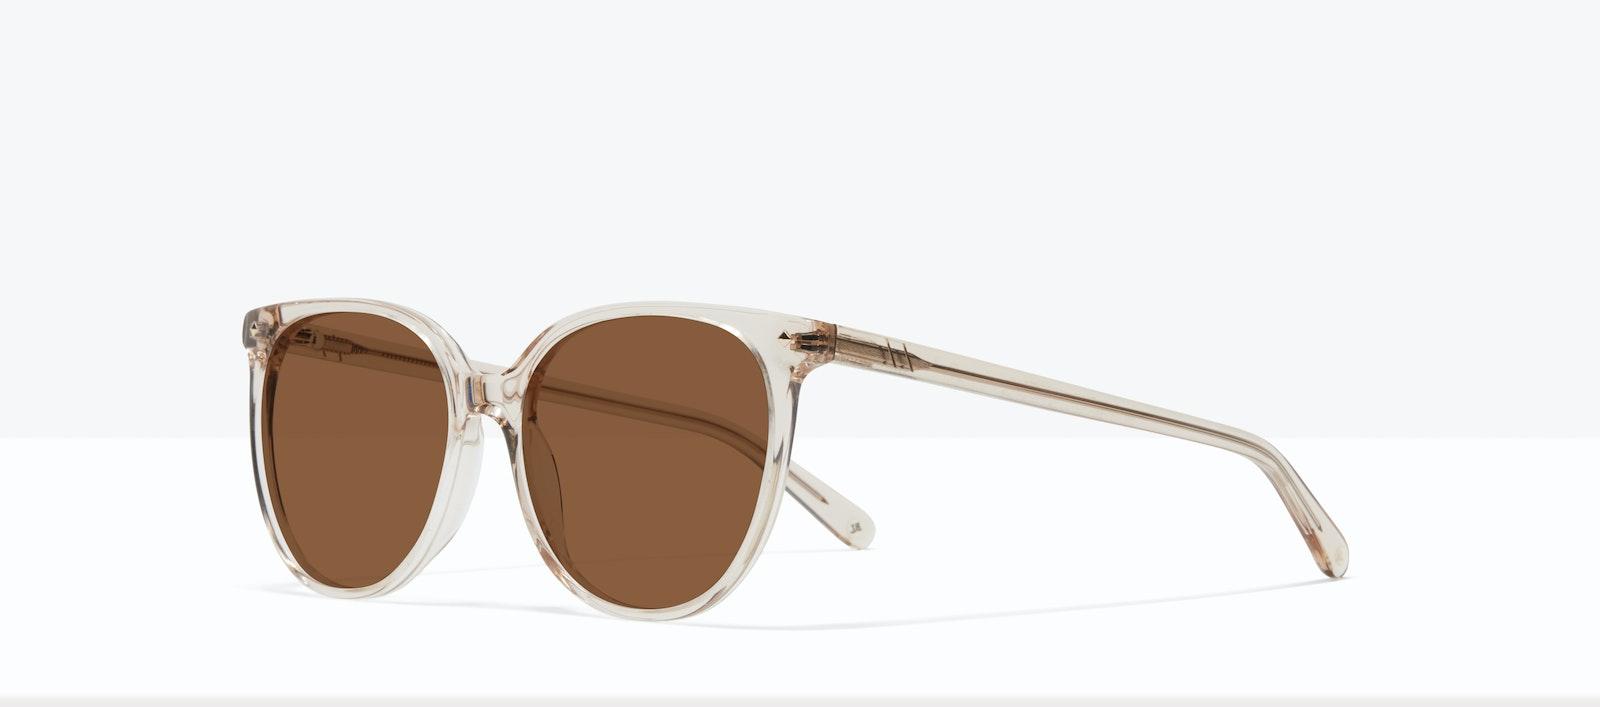 Affordable Fashion Glasses Round Sunglasses Women Area S Blond Tilt